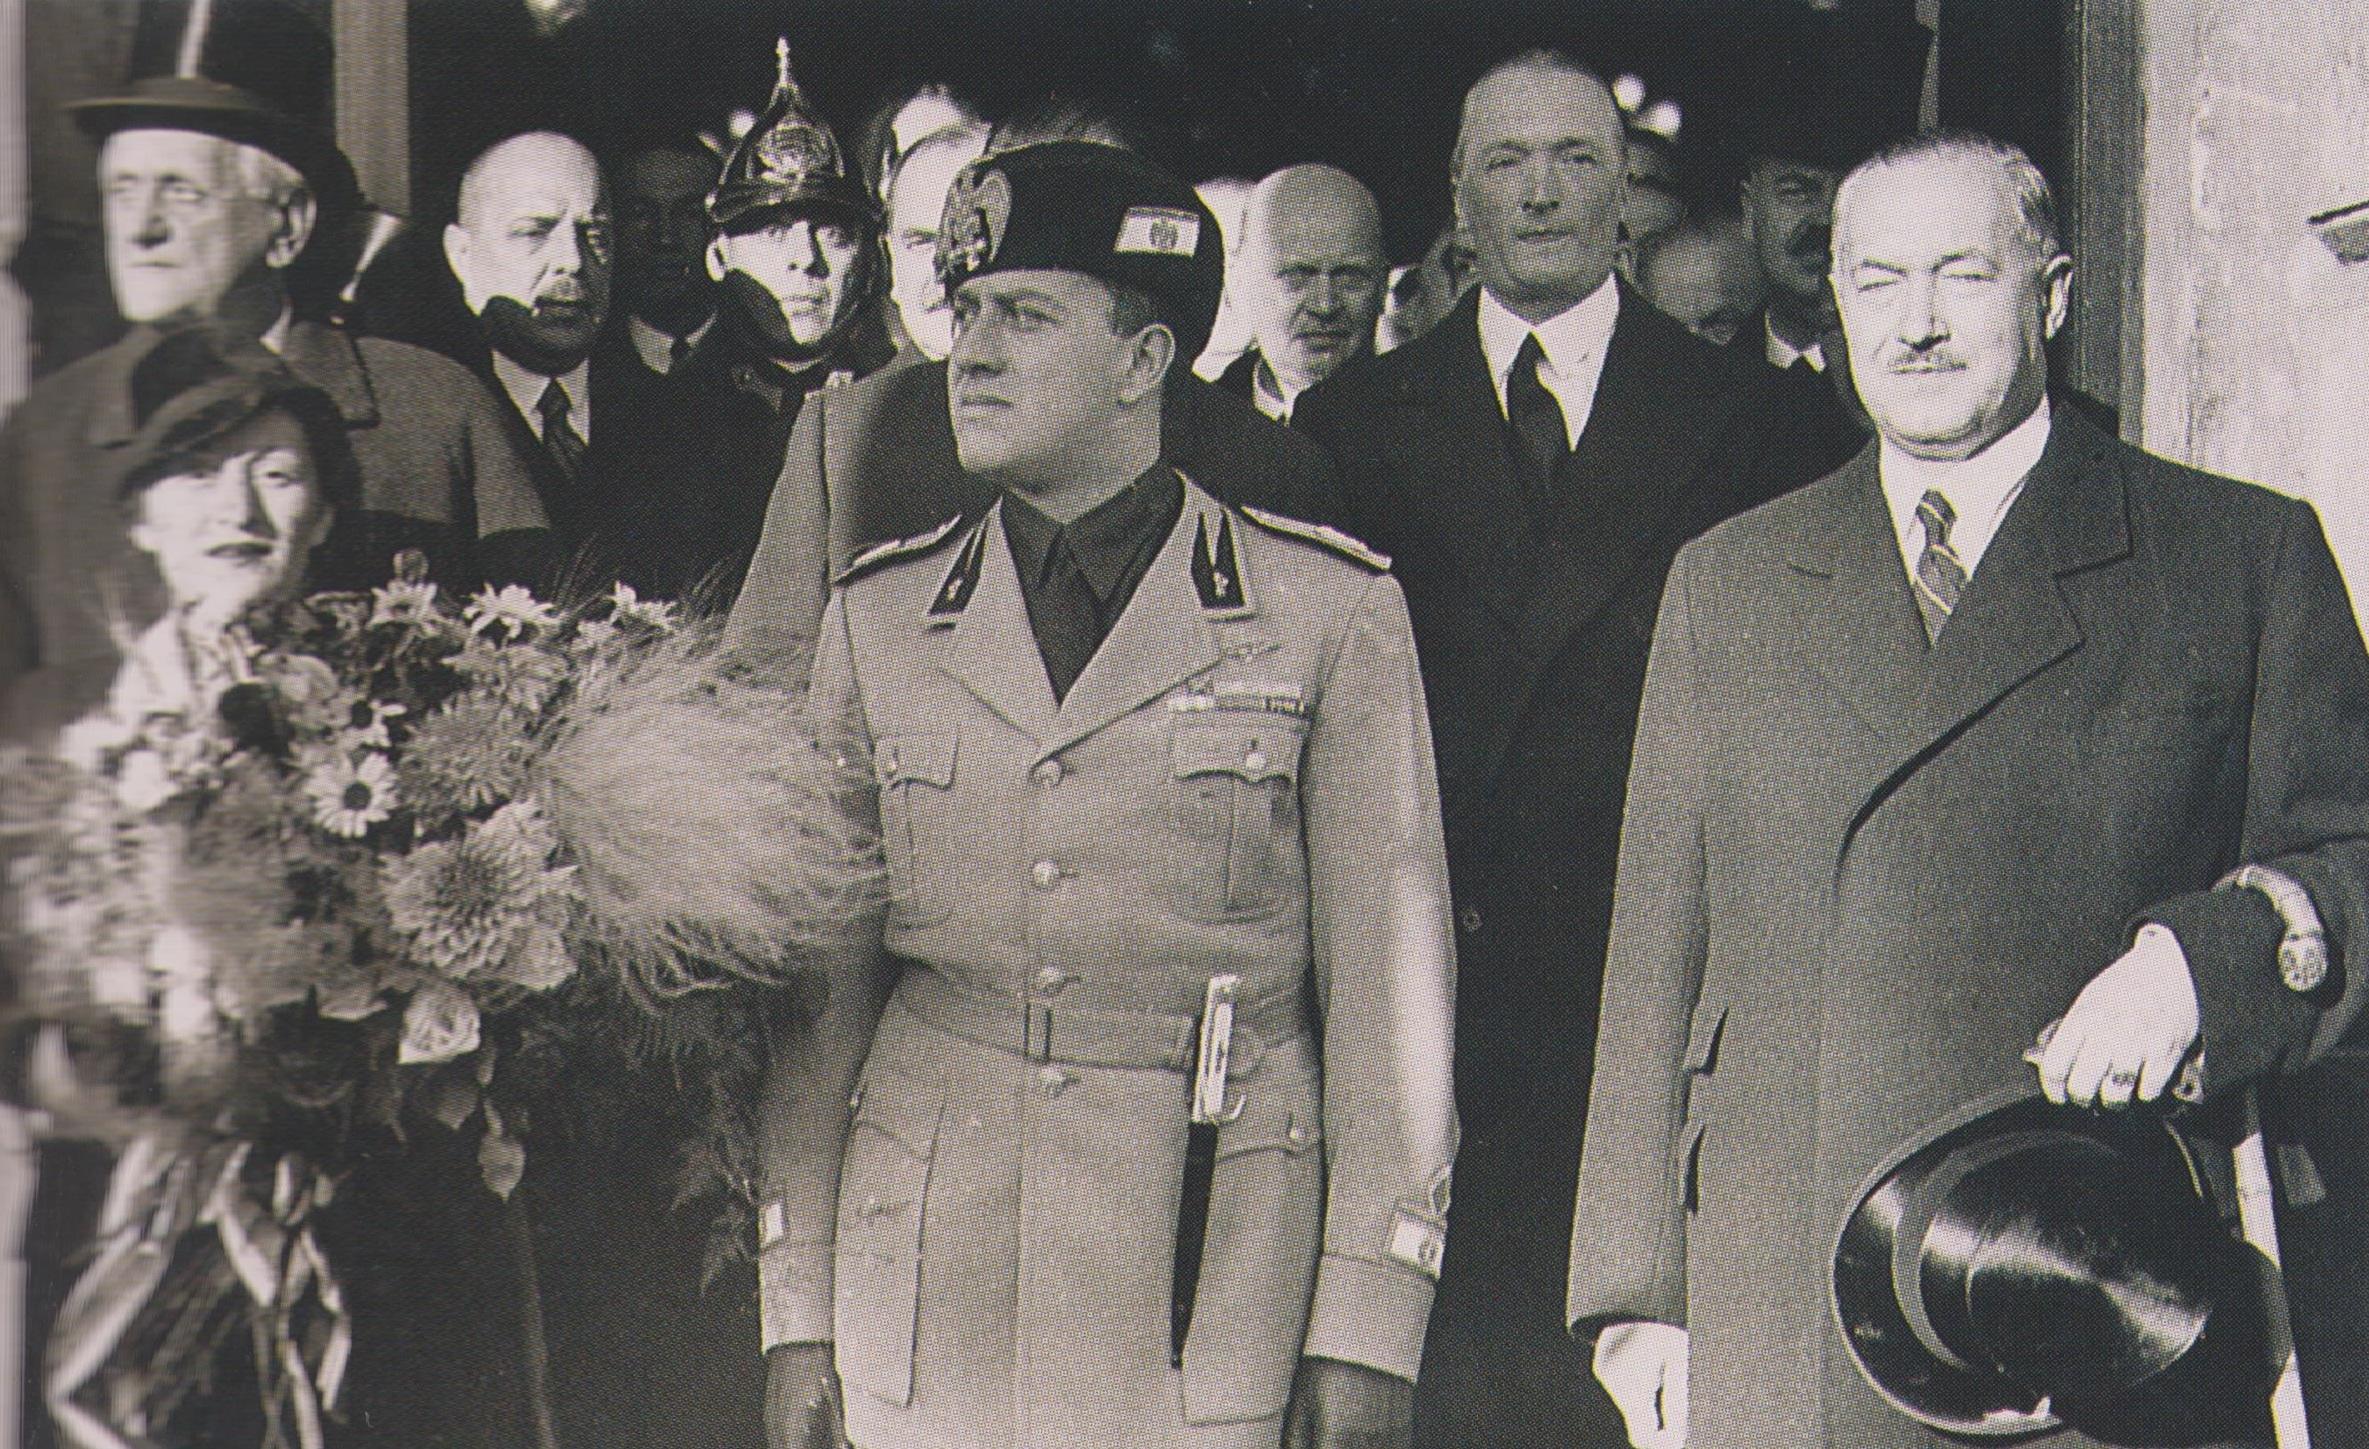 File:Darányi & Ciano 1936.jpg - Wikimedia Commons